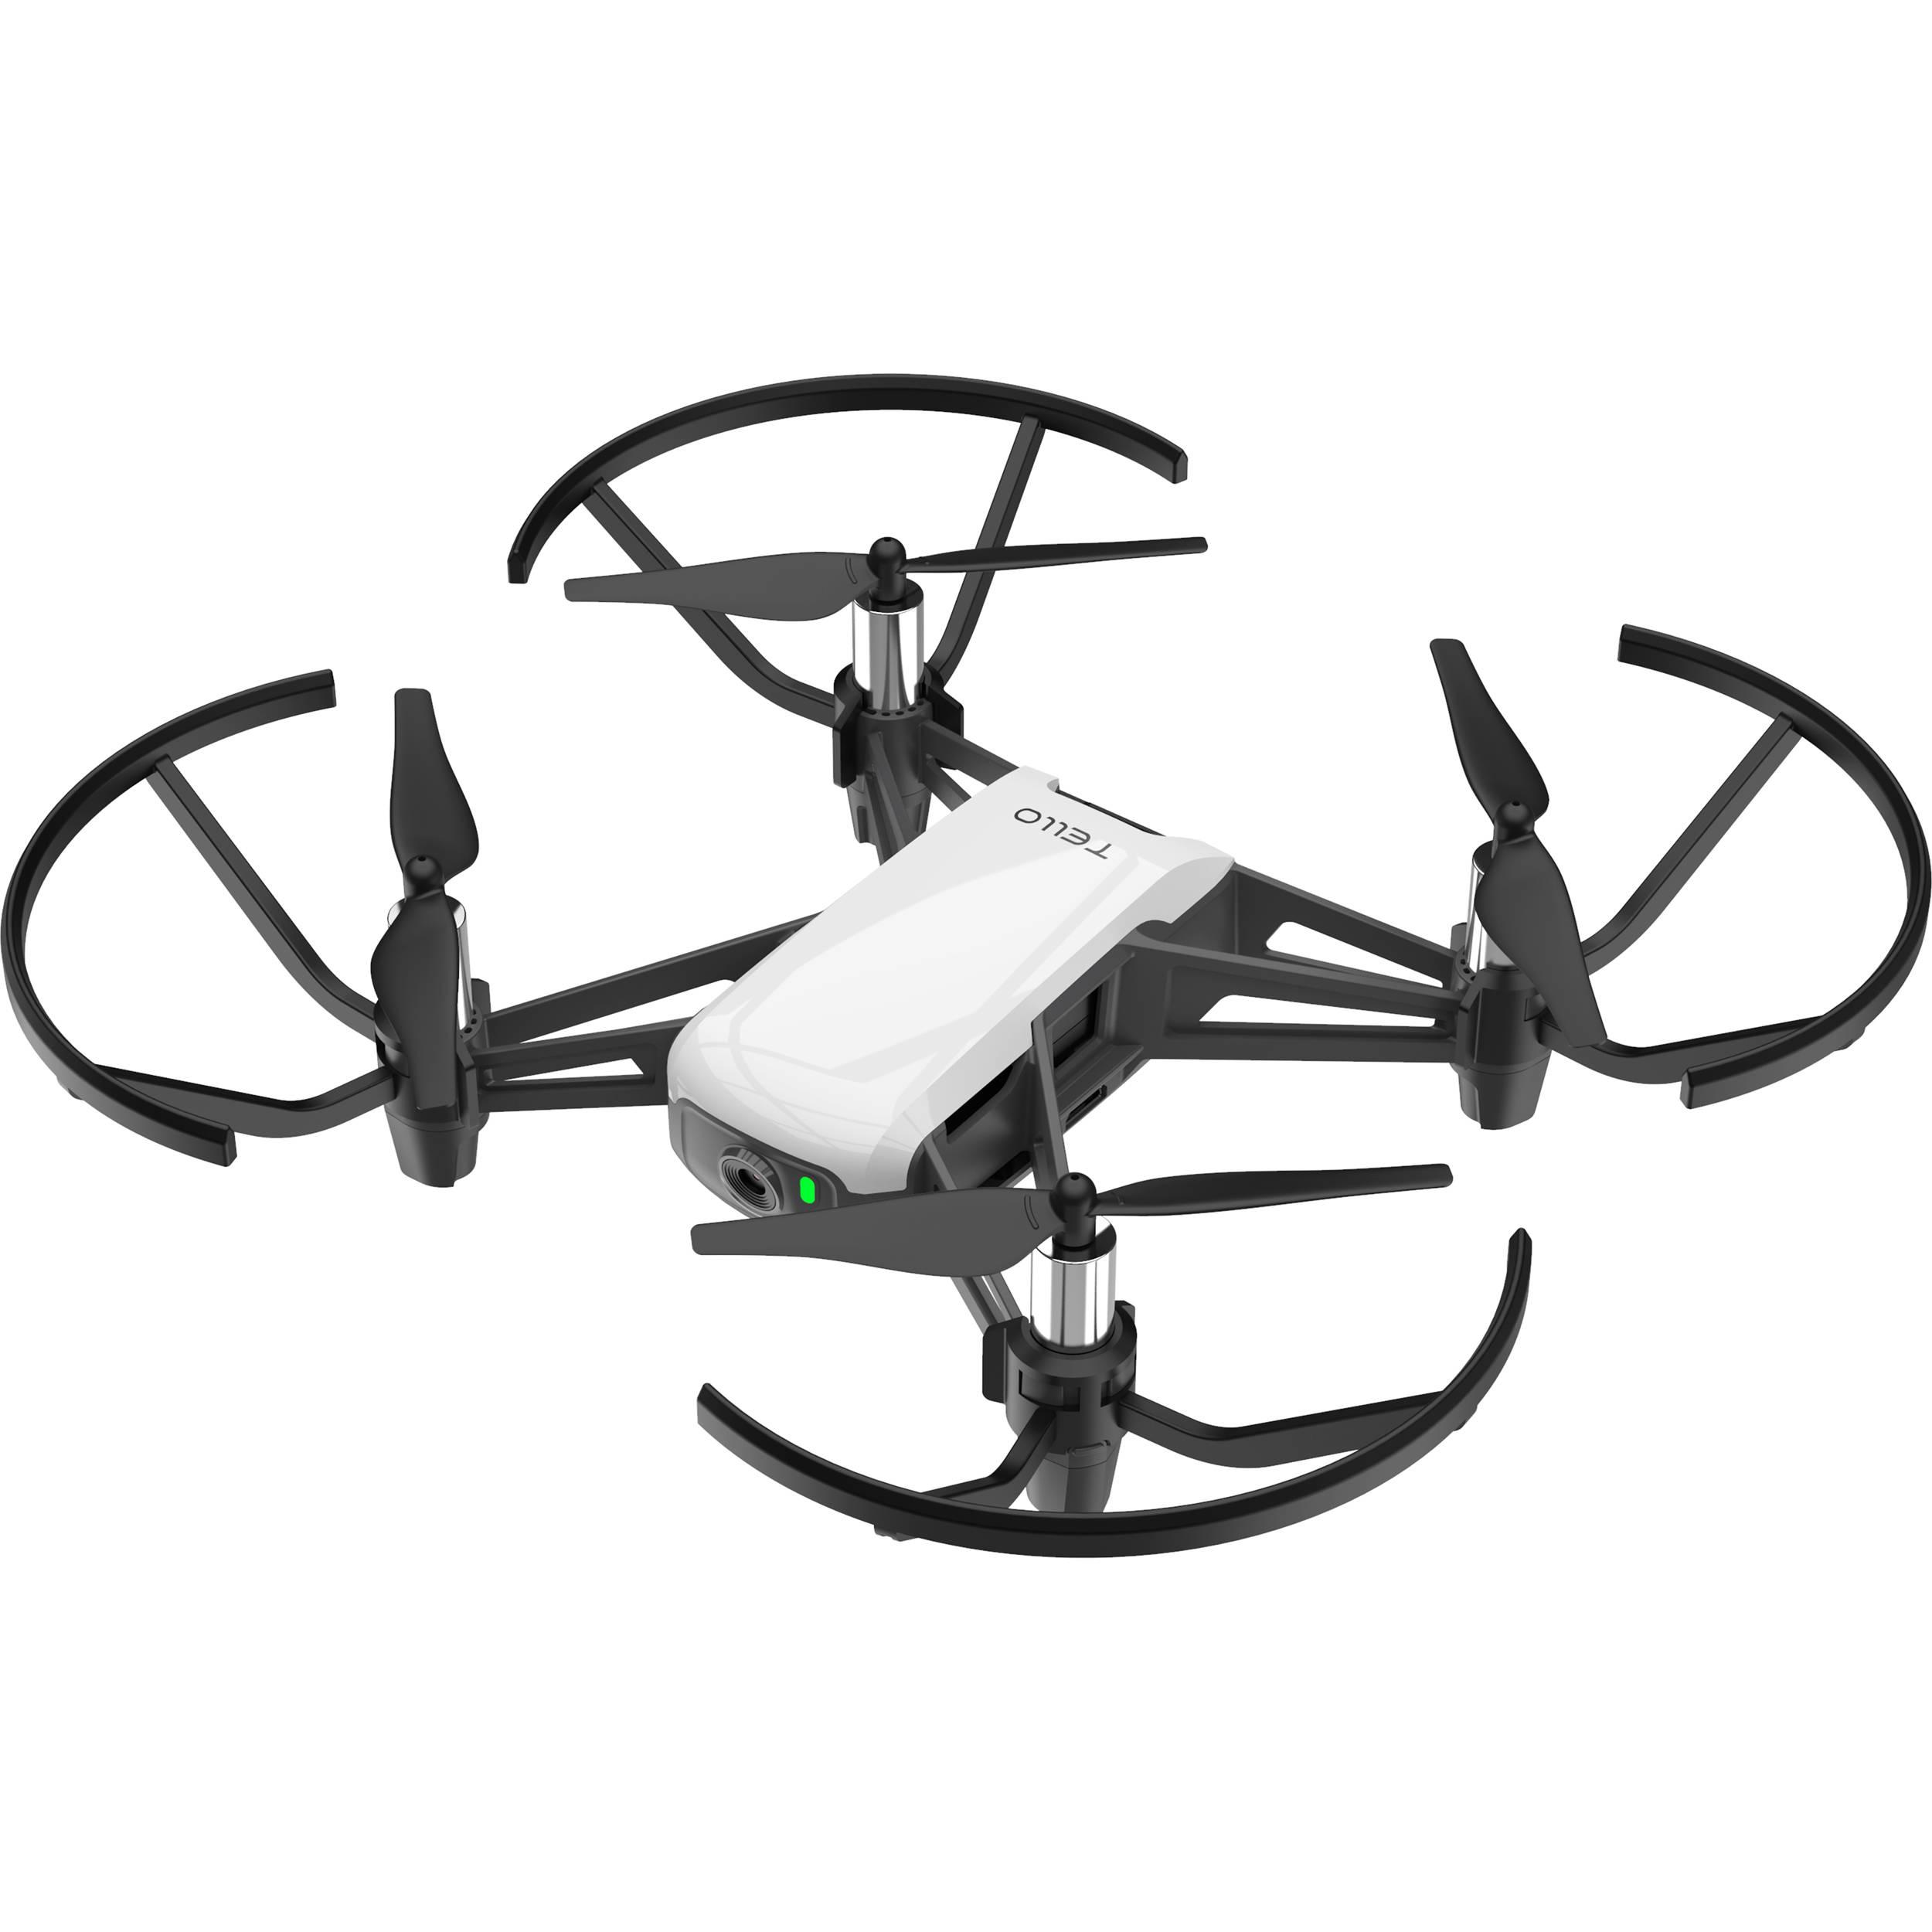 Dji Ryze Tello Drone Powered by DJI